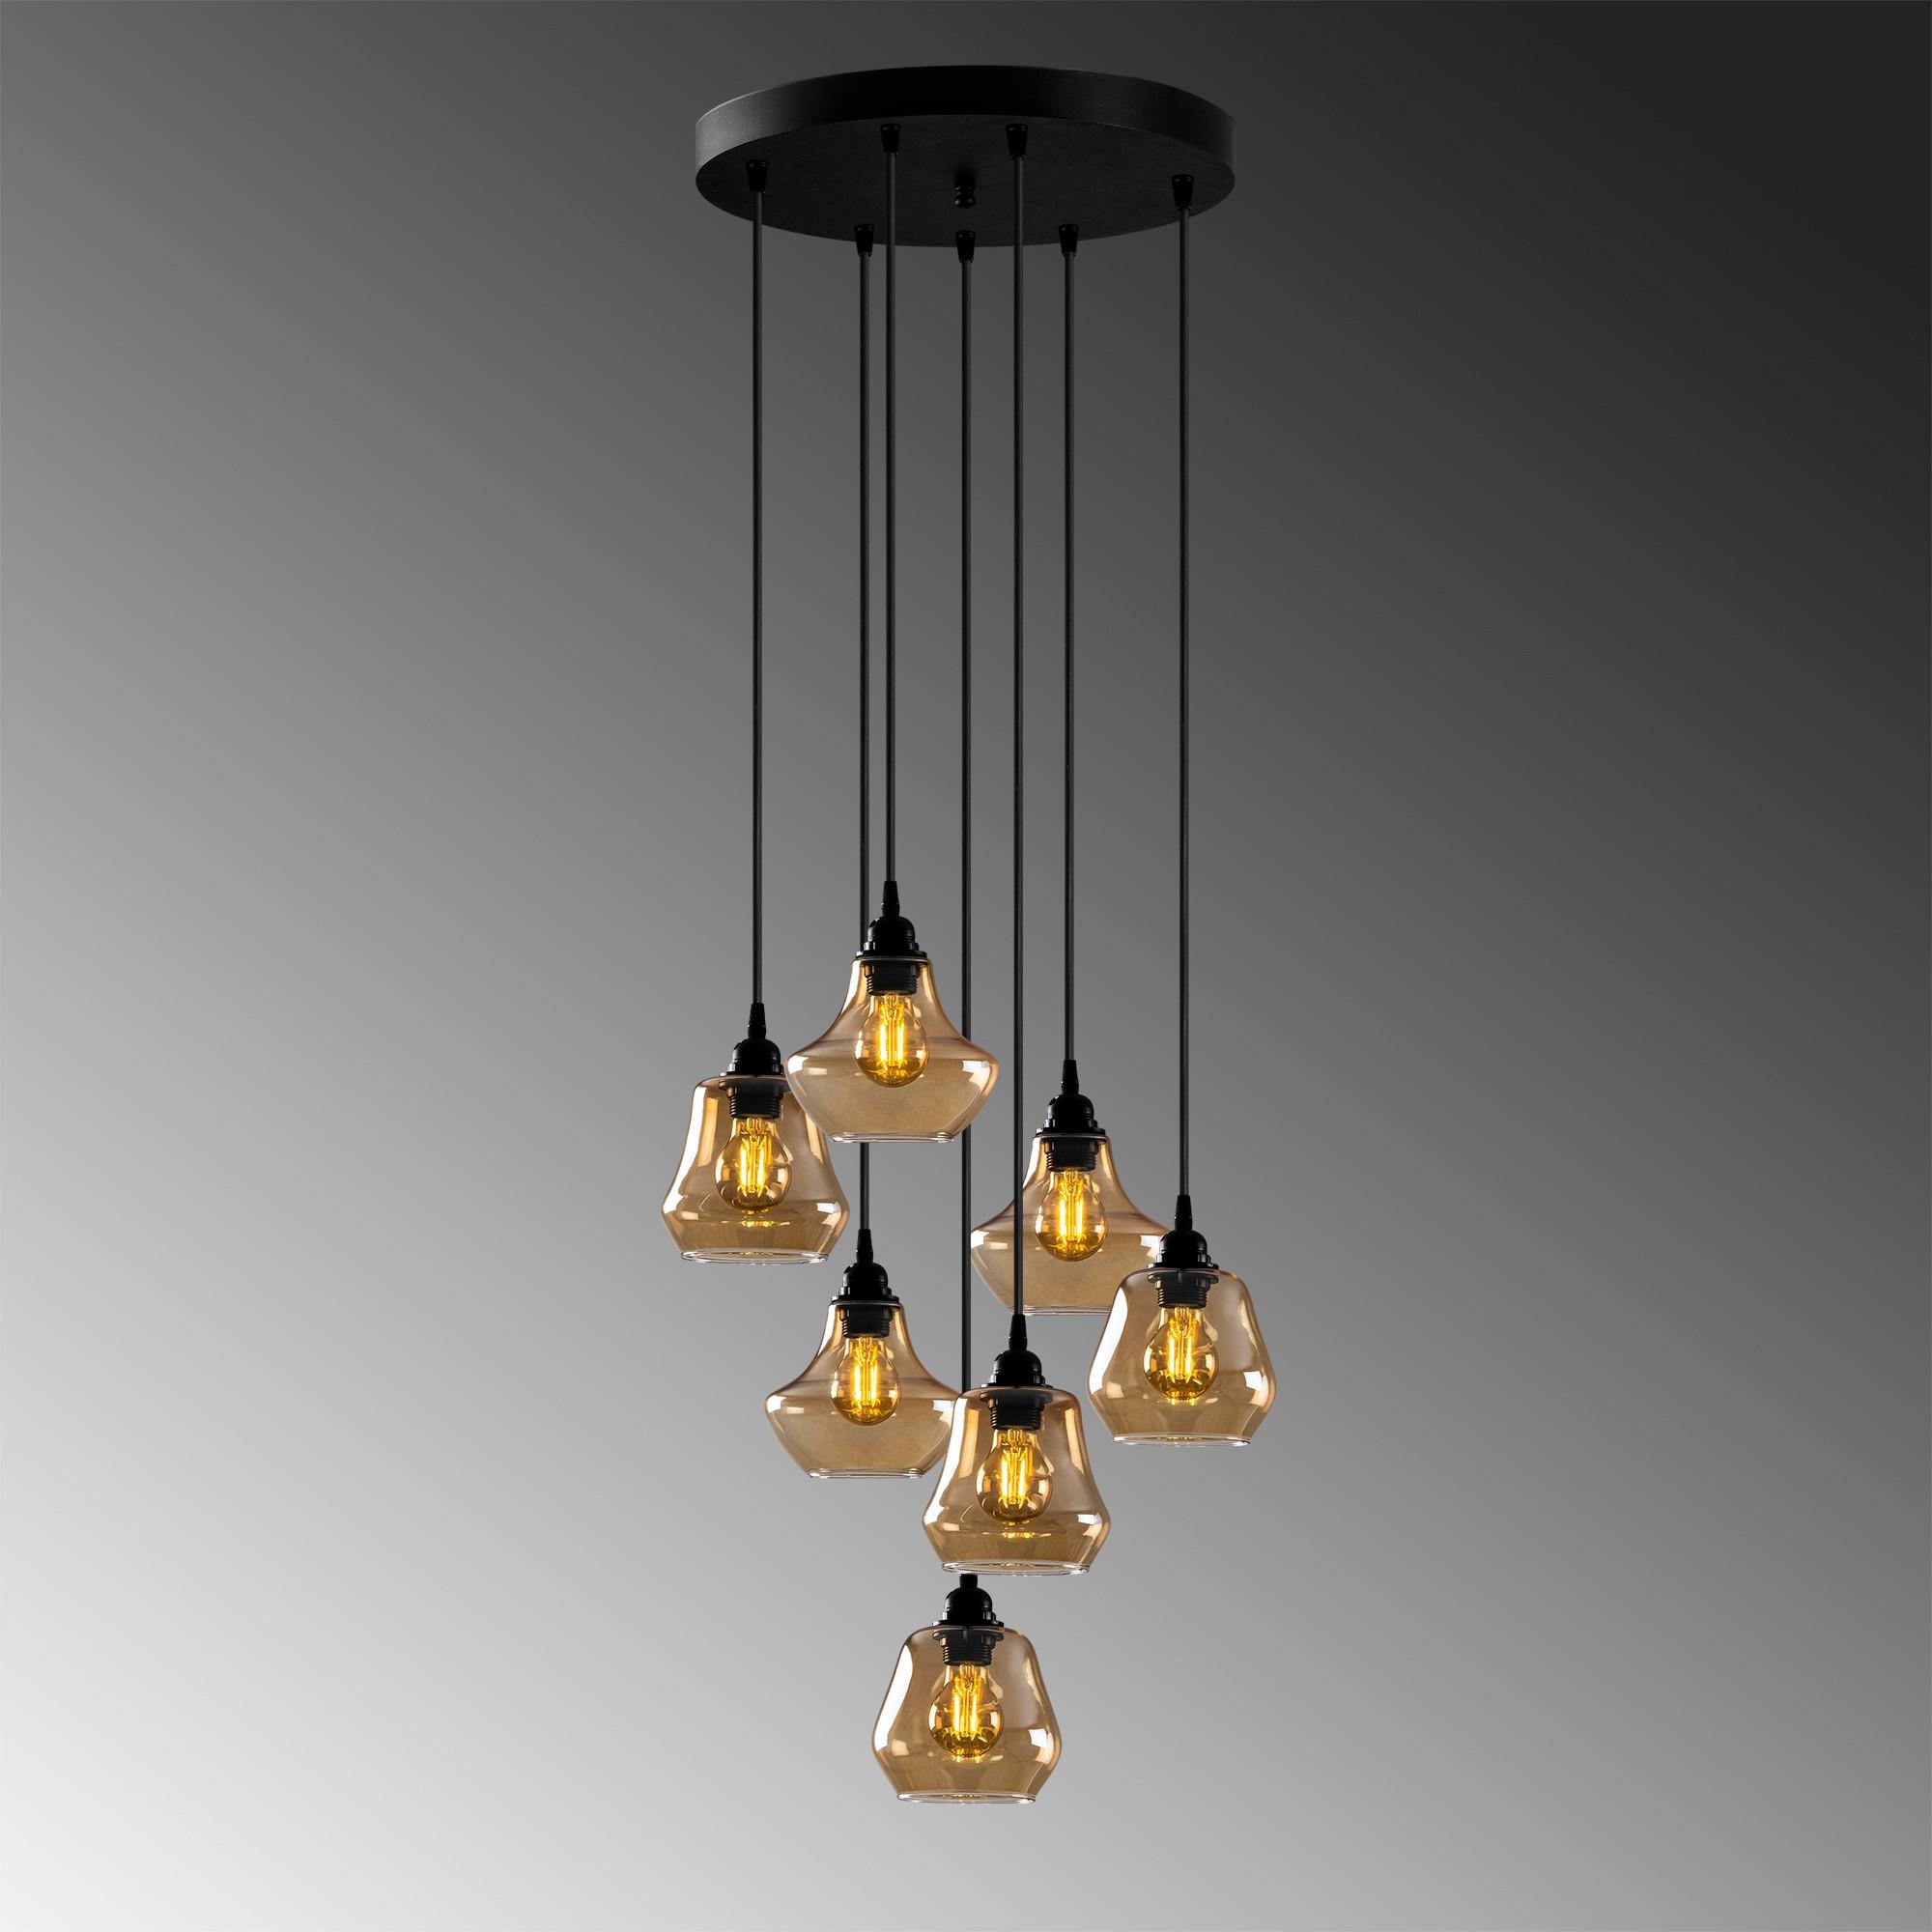 Hanglamp golden glass - goud glas 7 x E27 fitting - grijze achtergrond